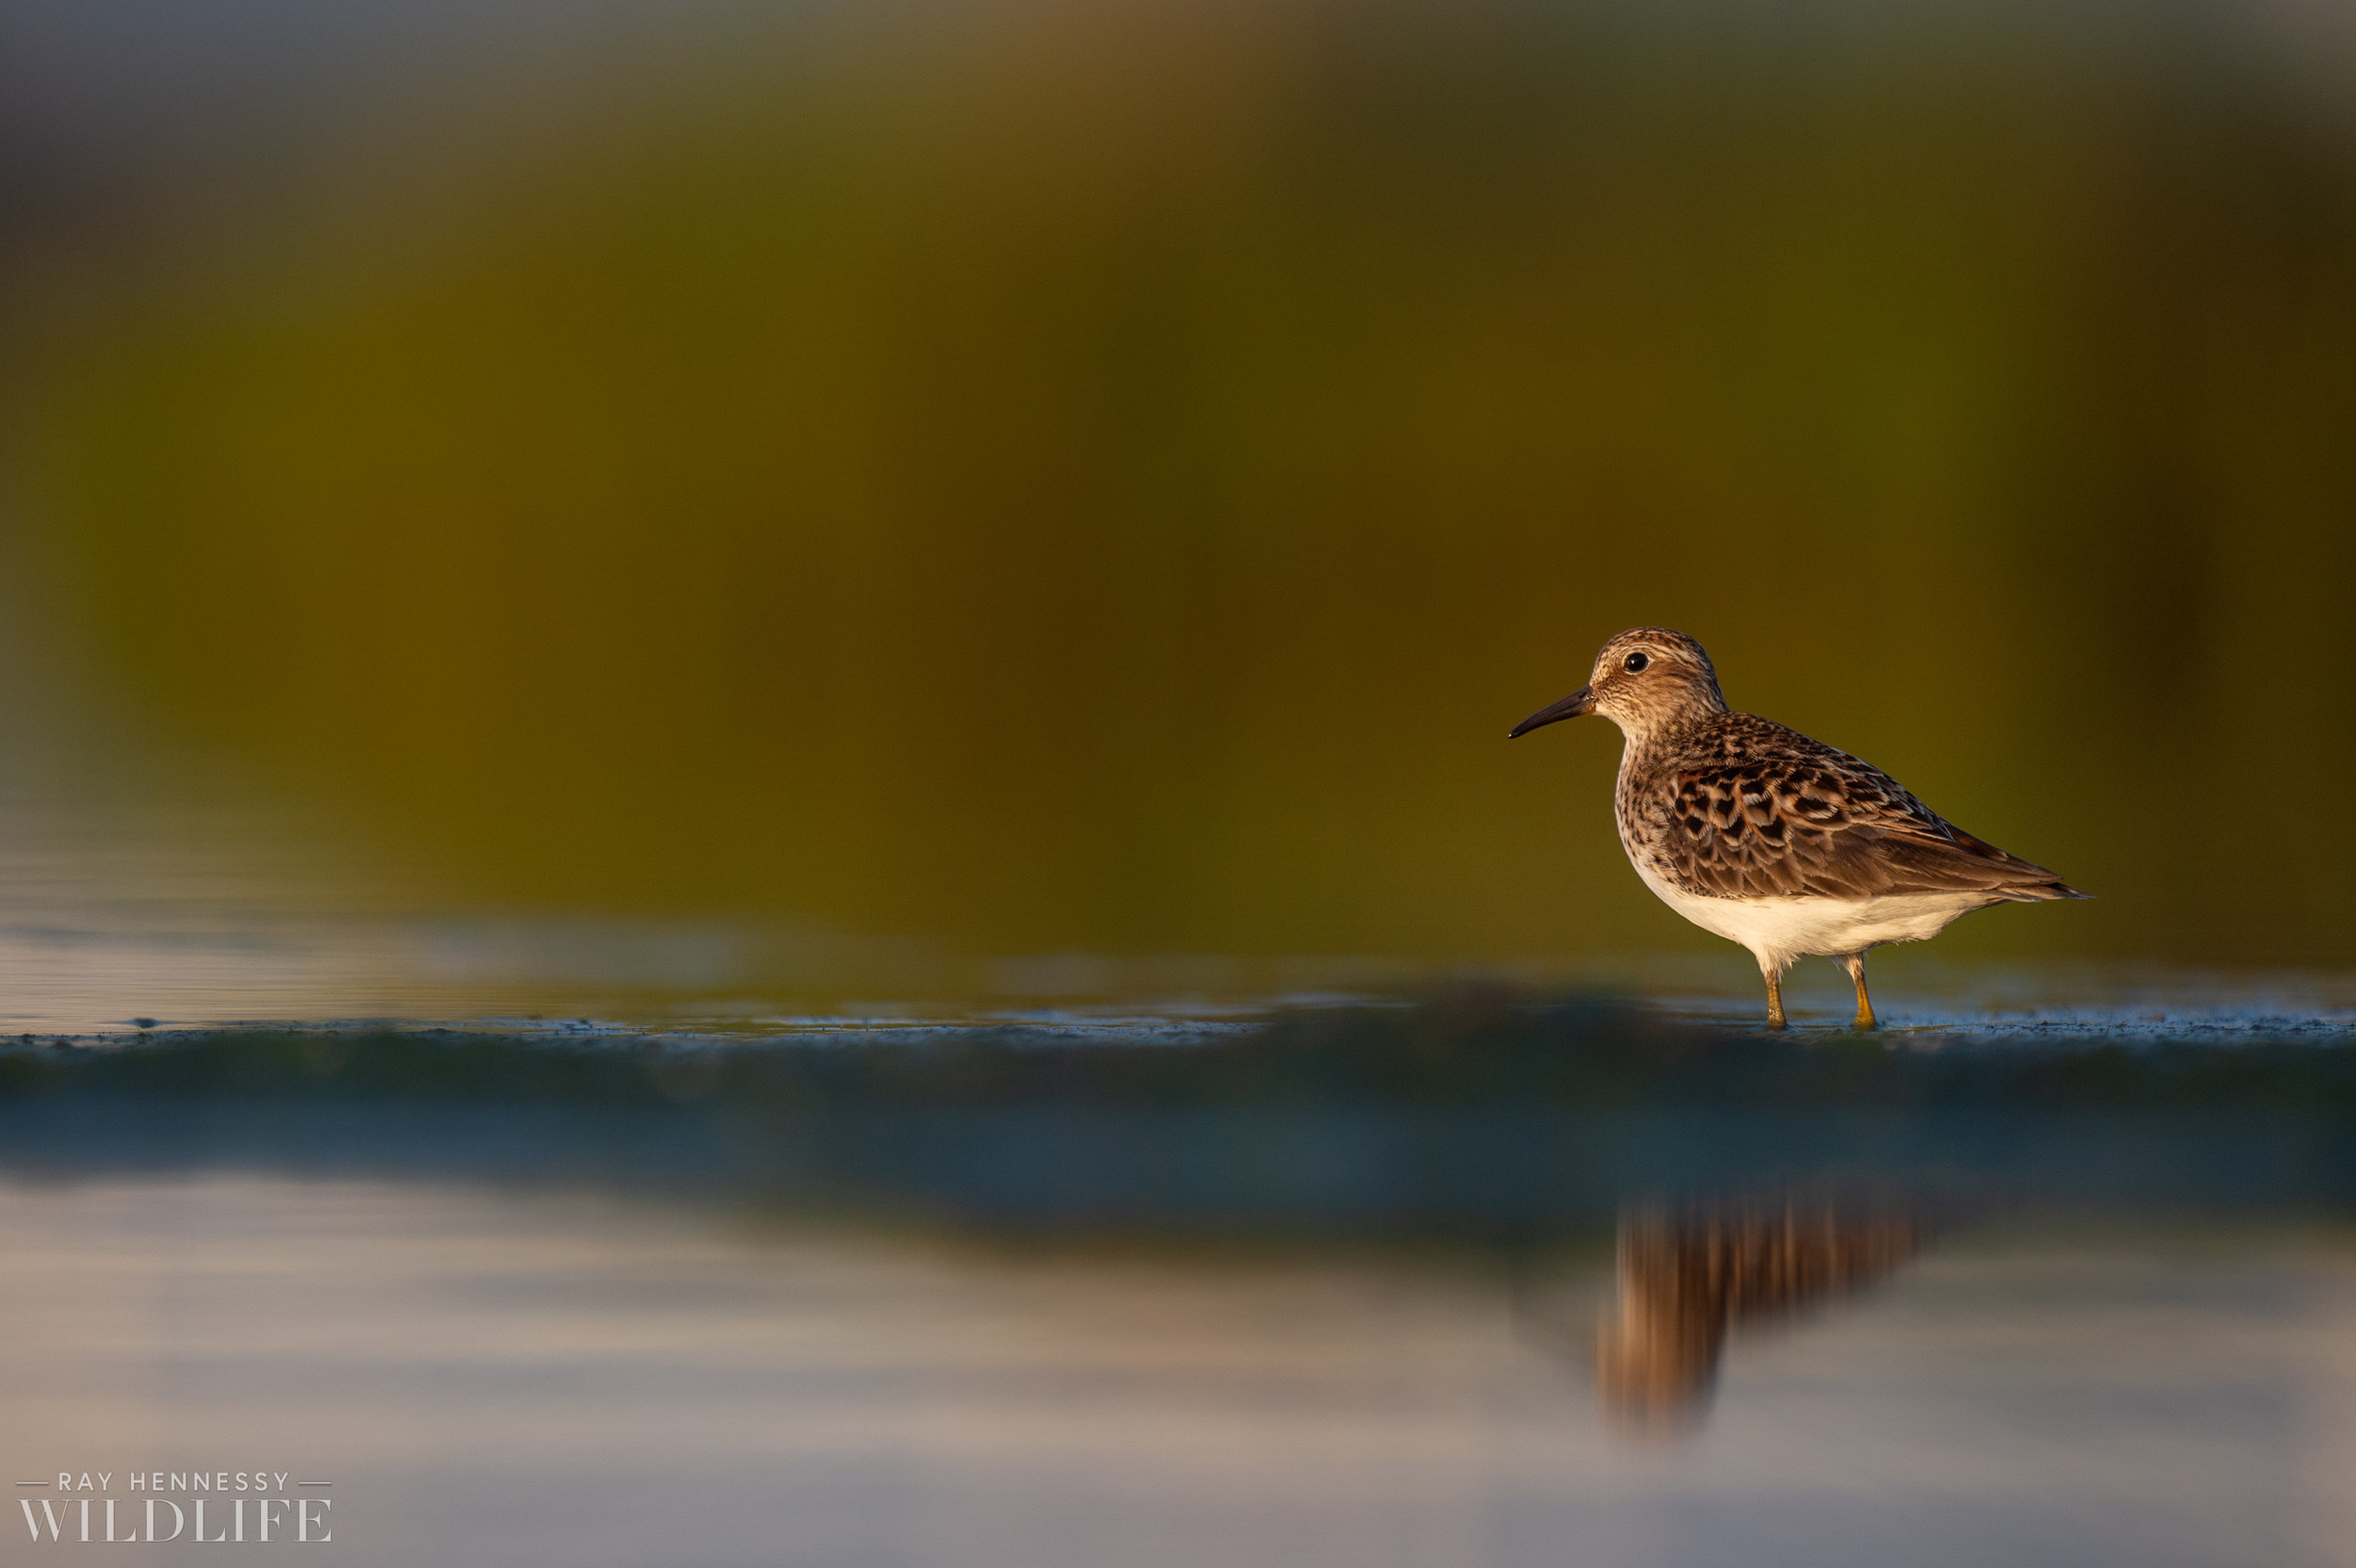 008_shorebirds-prothonotary-warbler.jpg